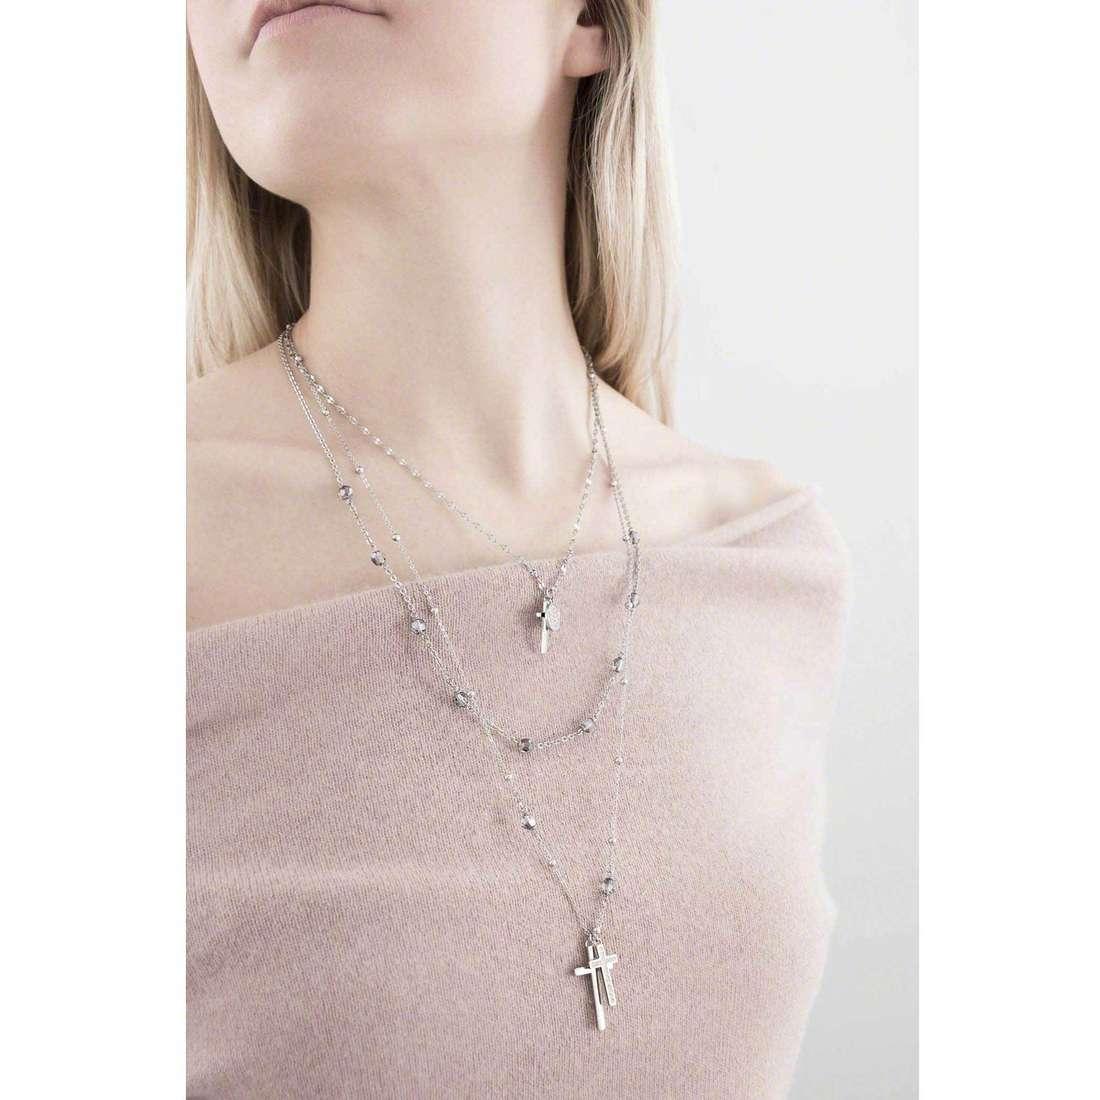 Brosway colliers Dogma femme BDO02 indosso